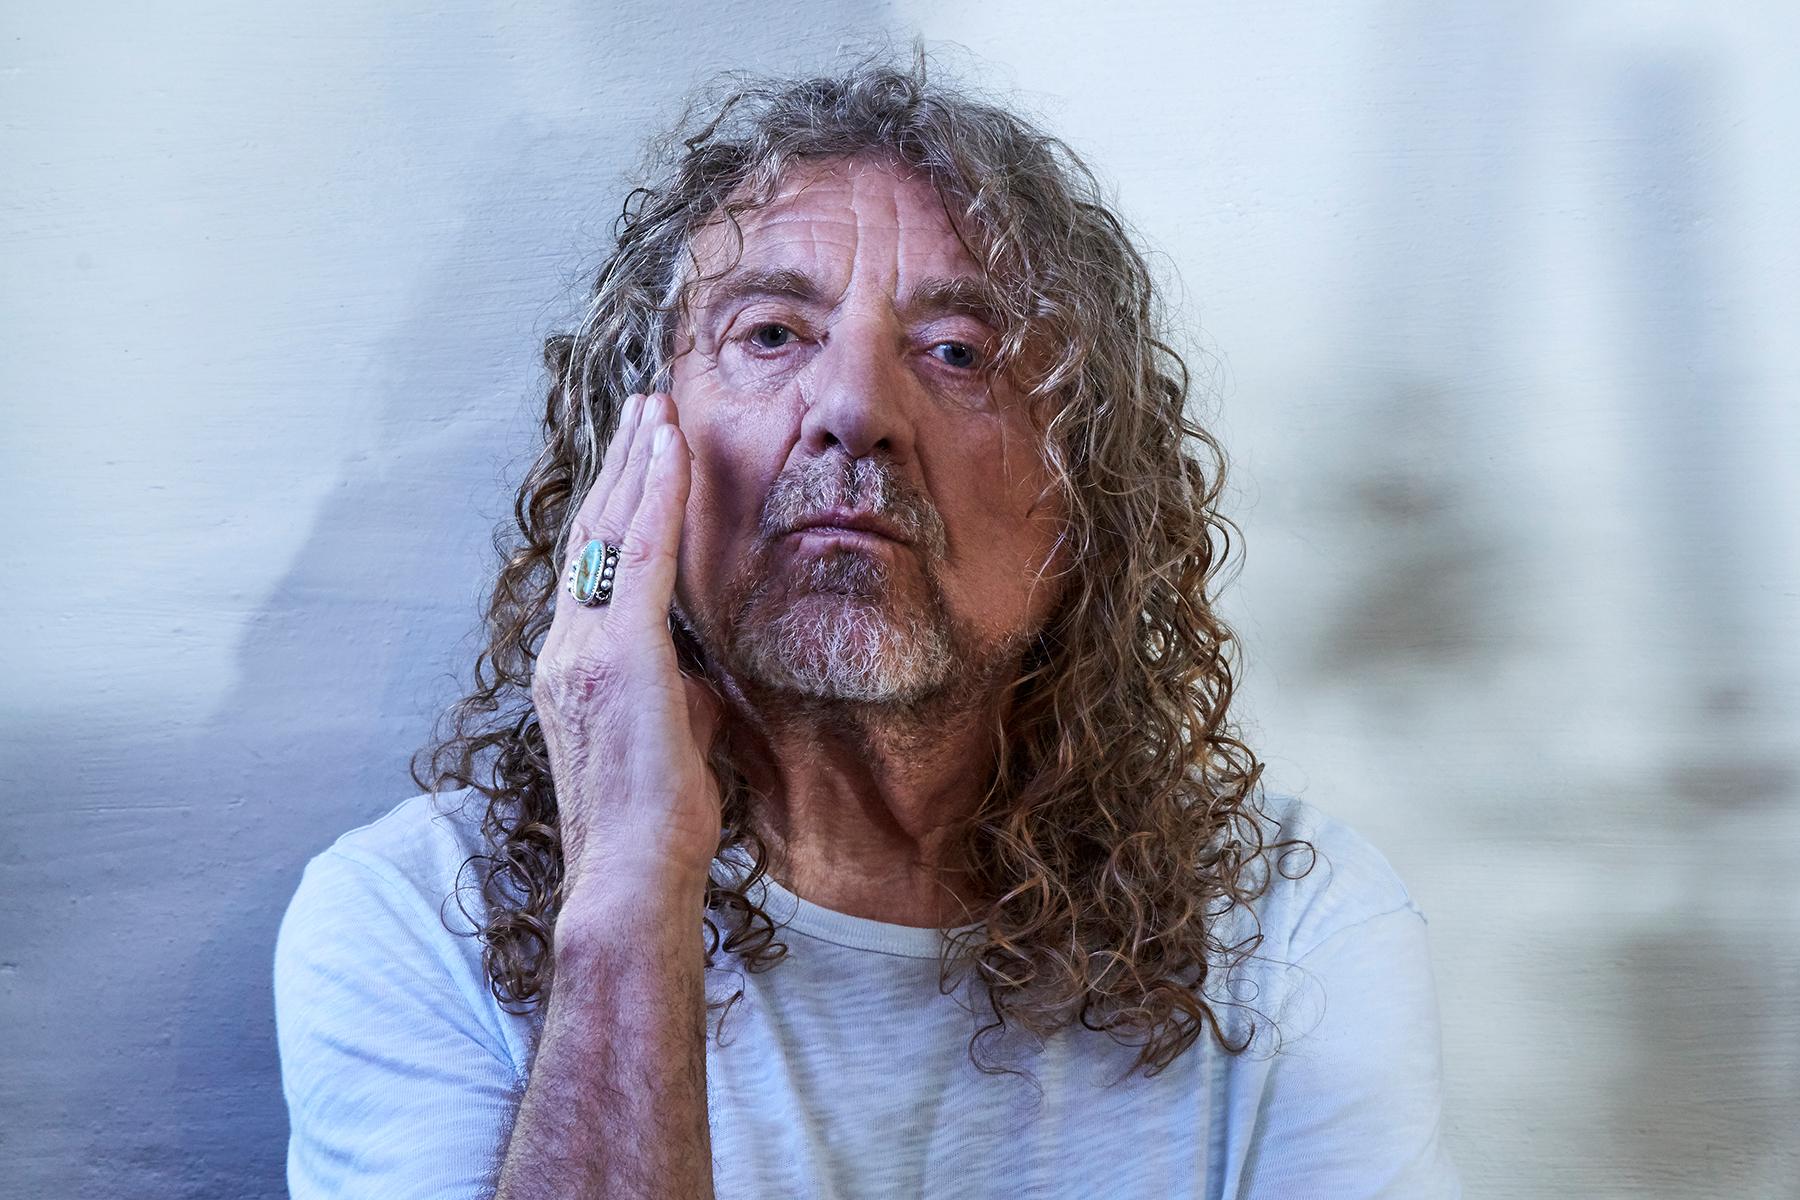 Robert Plant to Release 'Digging Deep' Career Anthology